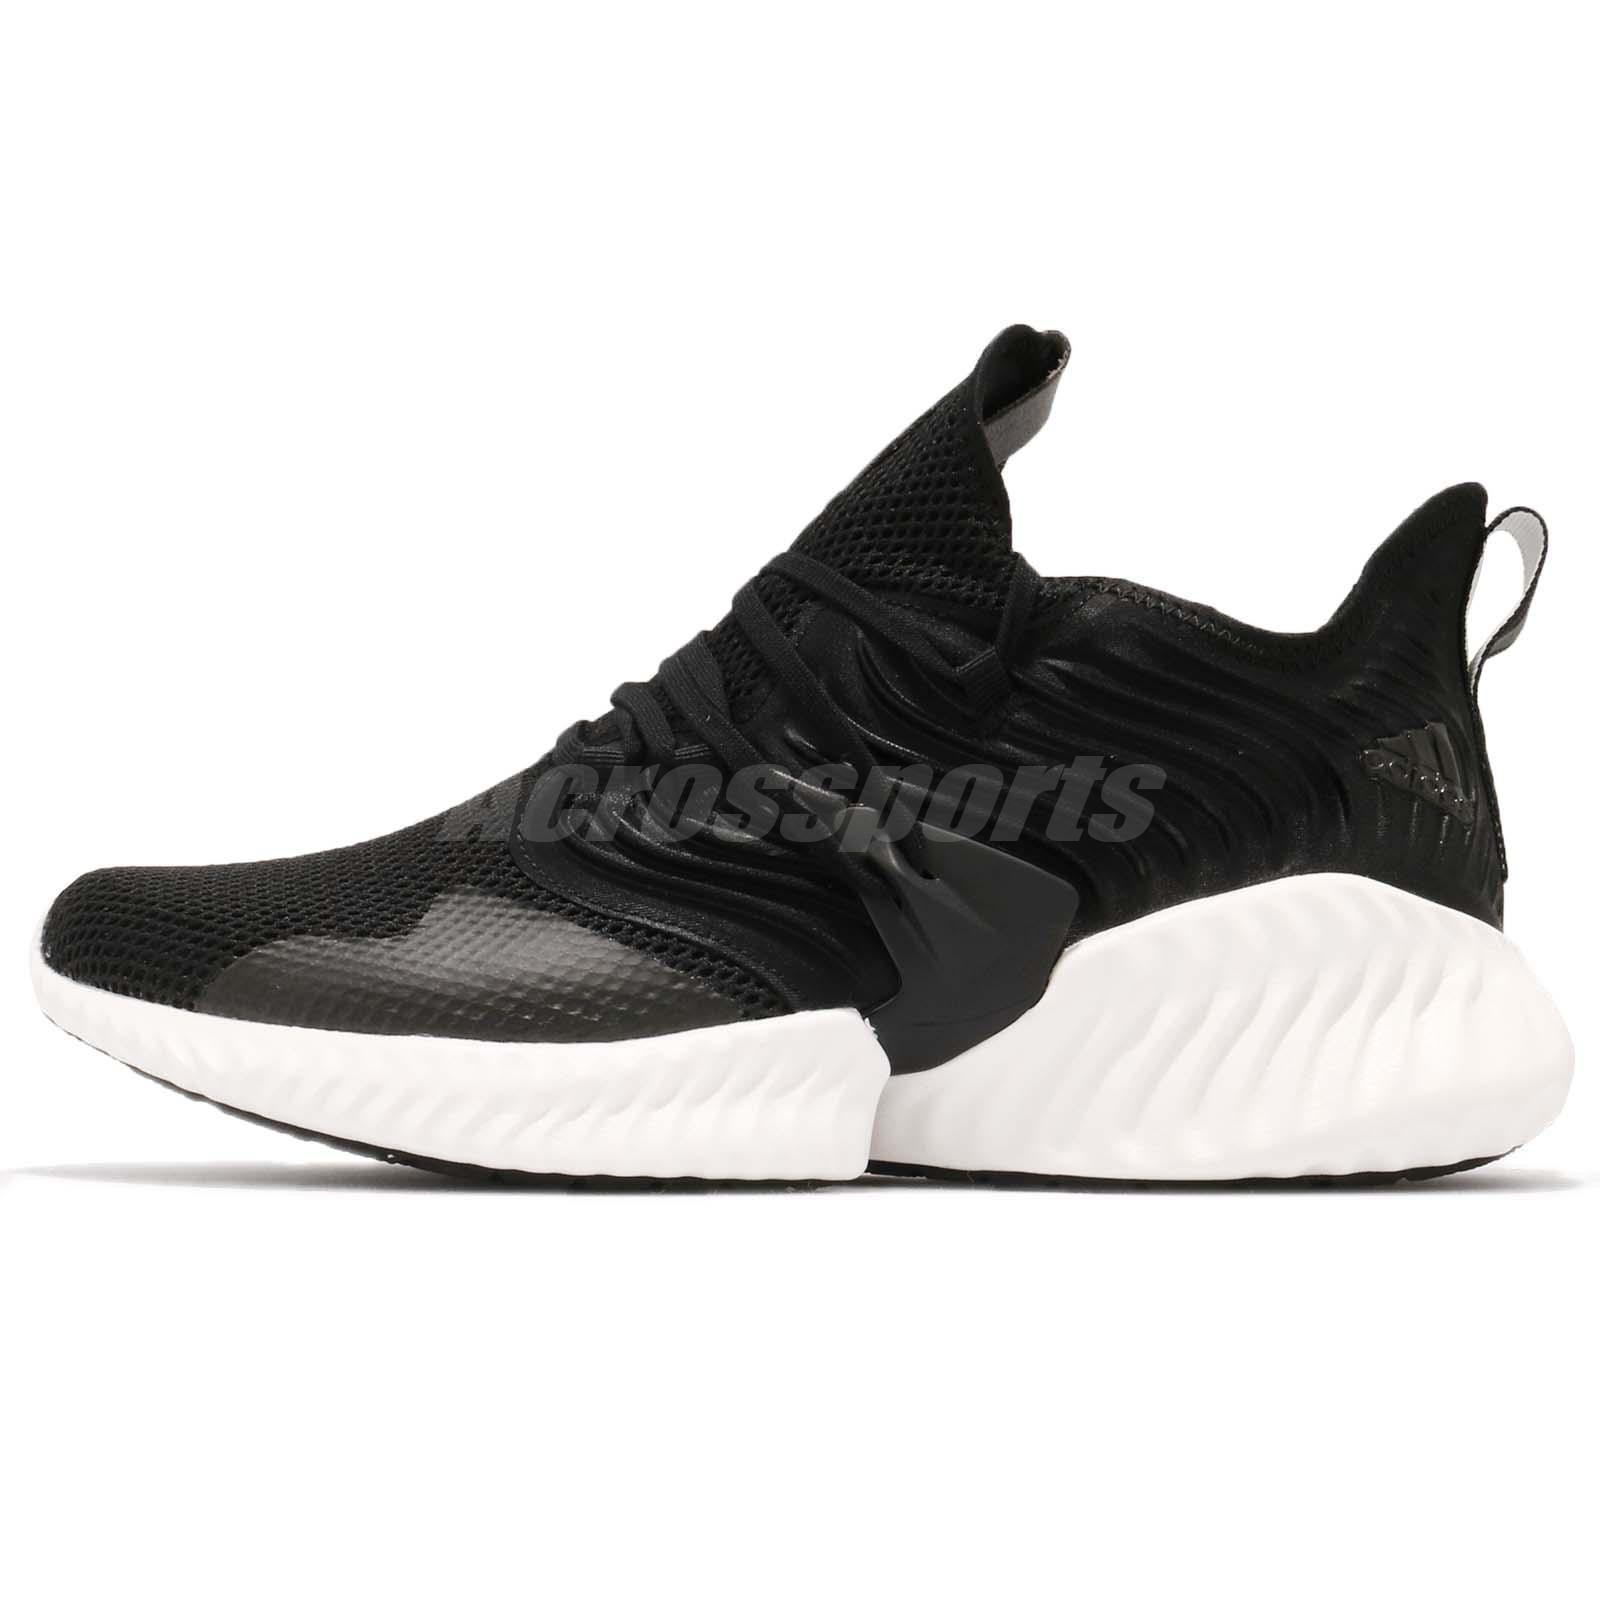 timeless design 960d9 fbc60 adidas Alphabounce Instinct CC M Clima Black White Men Running Shoes D97280